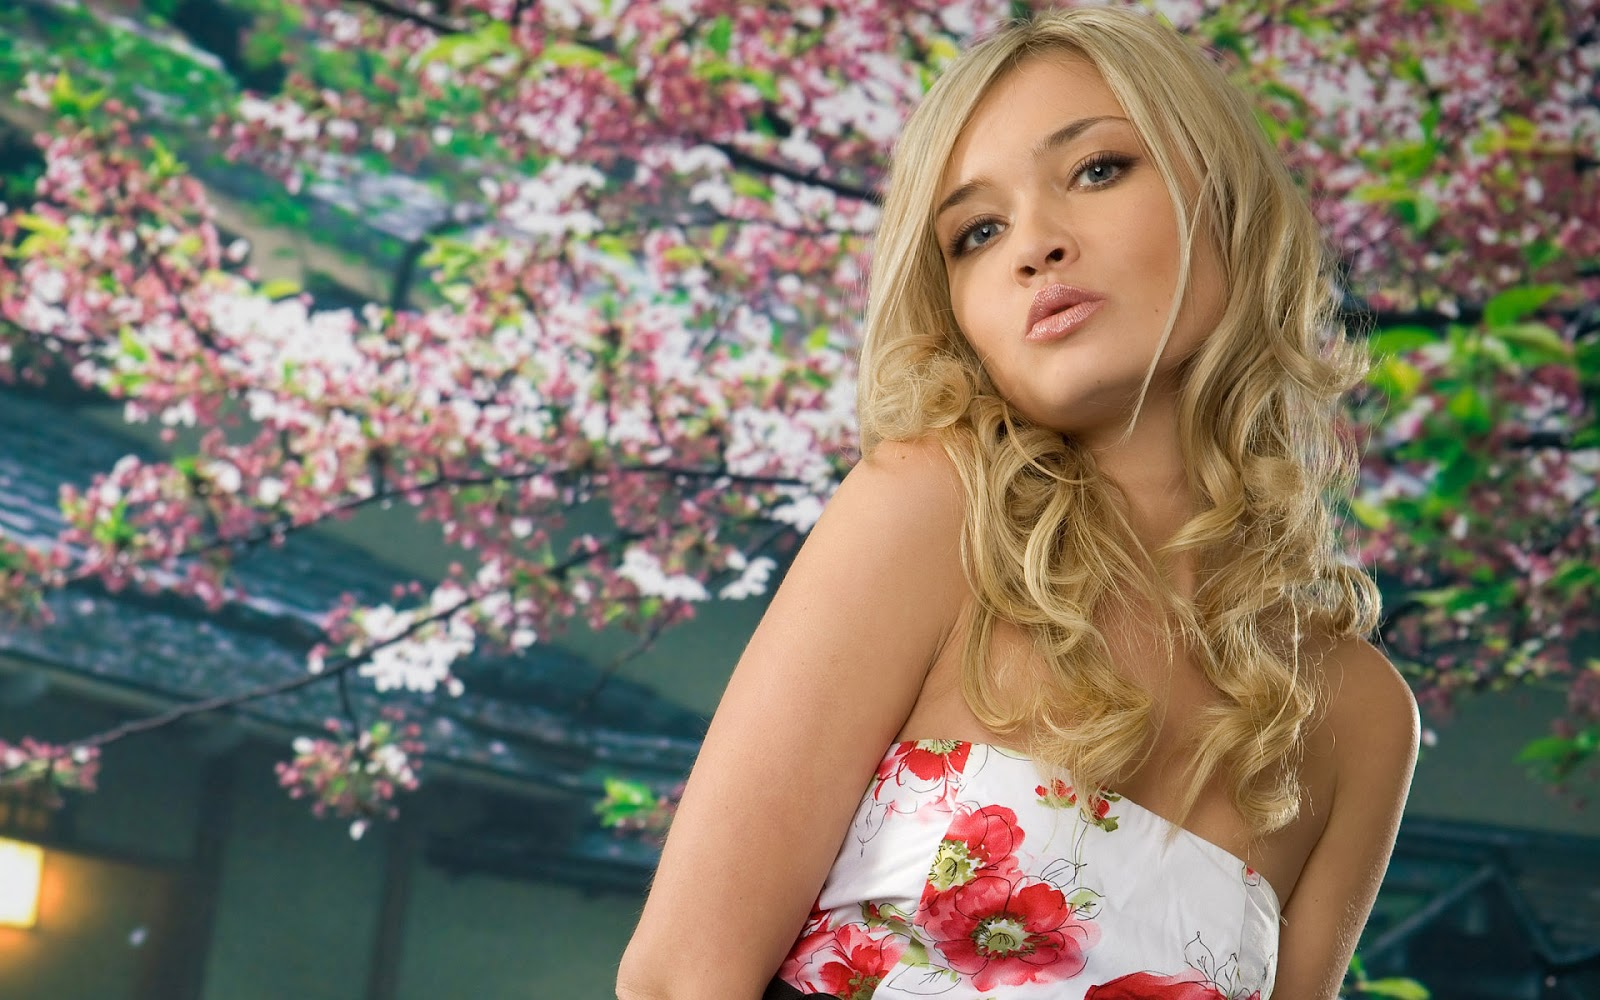 HD Wallpapers Christina Applegate HD Wallpapers 1600x1000